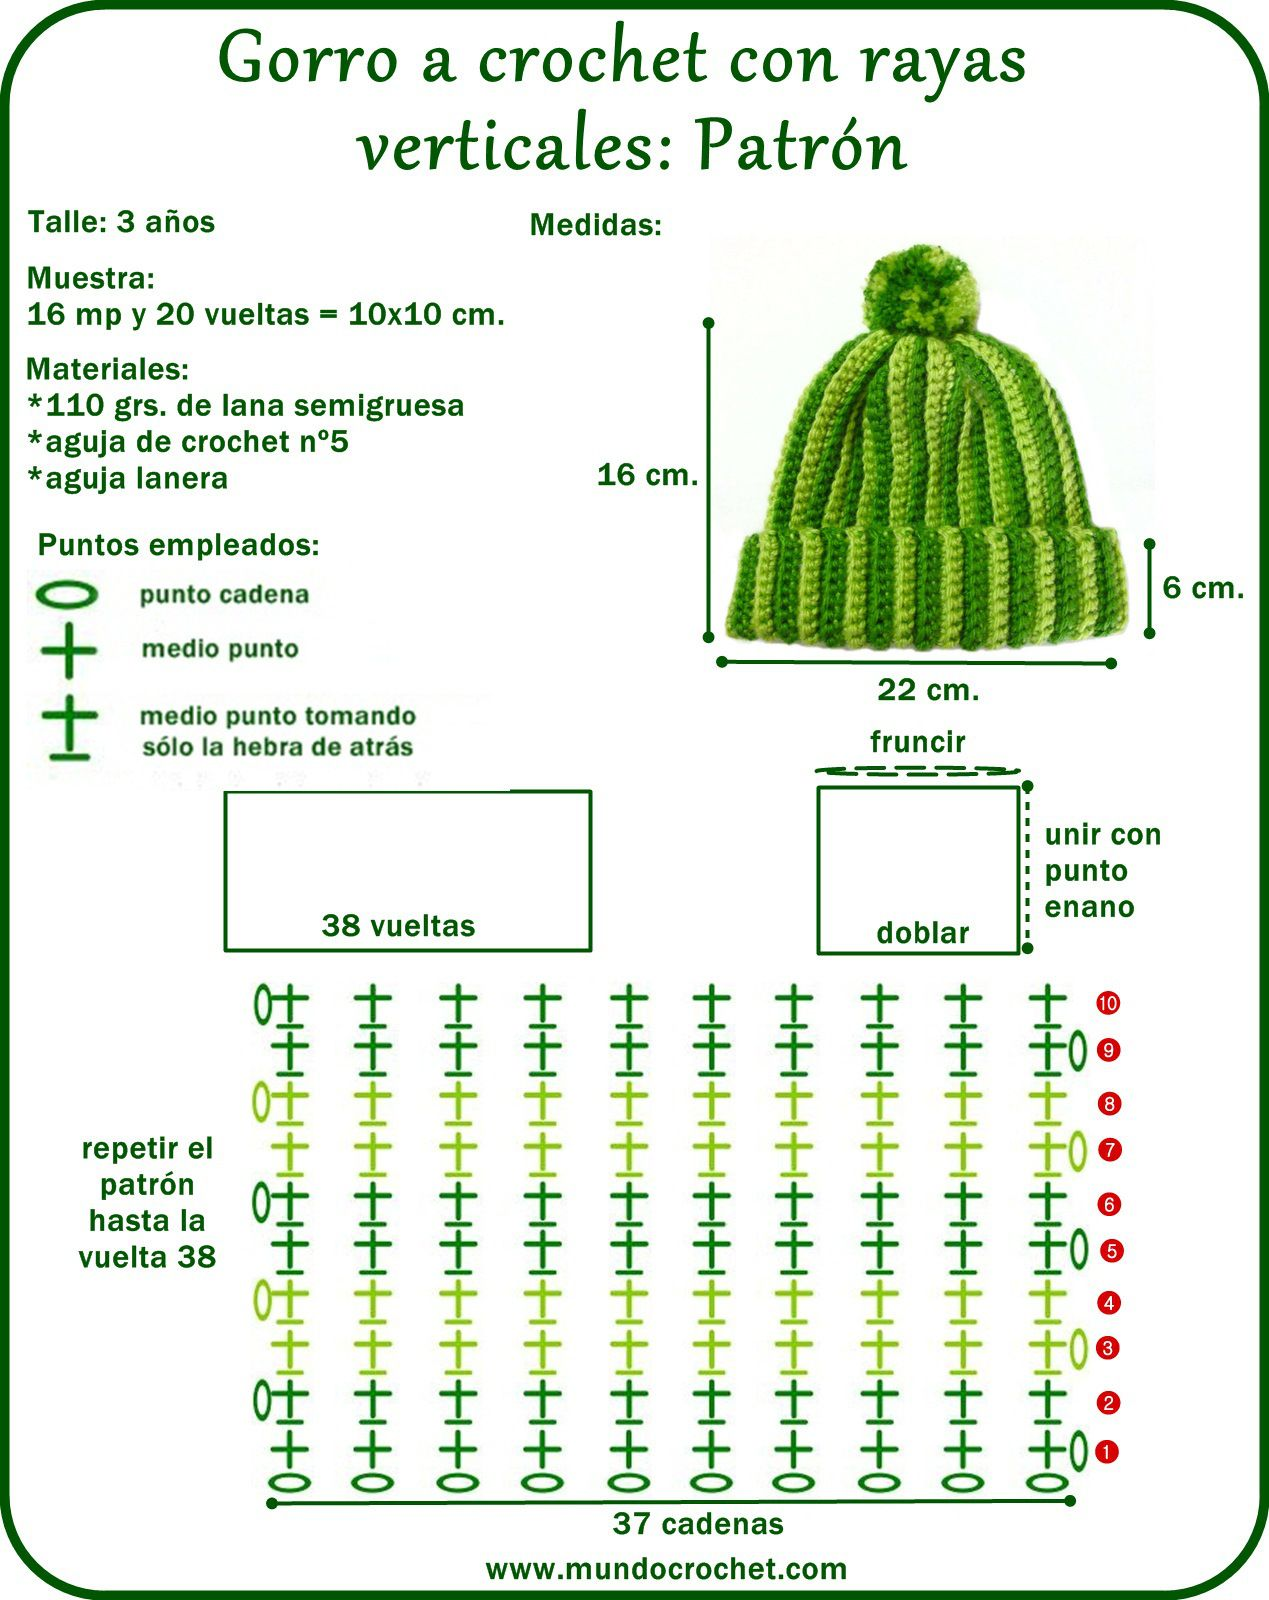 Gorro a crochet rayas verticales | Crochet | Pinterest | Rayas ...